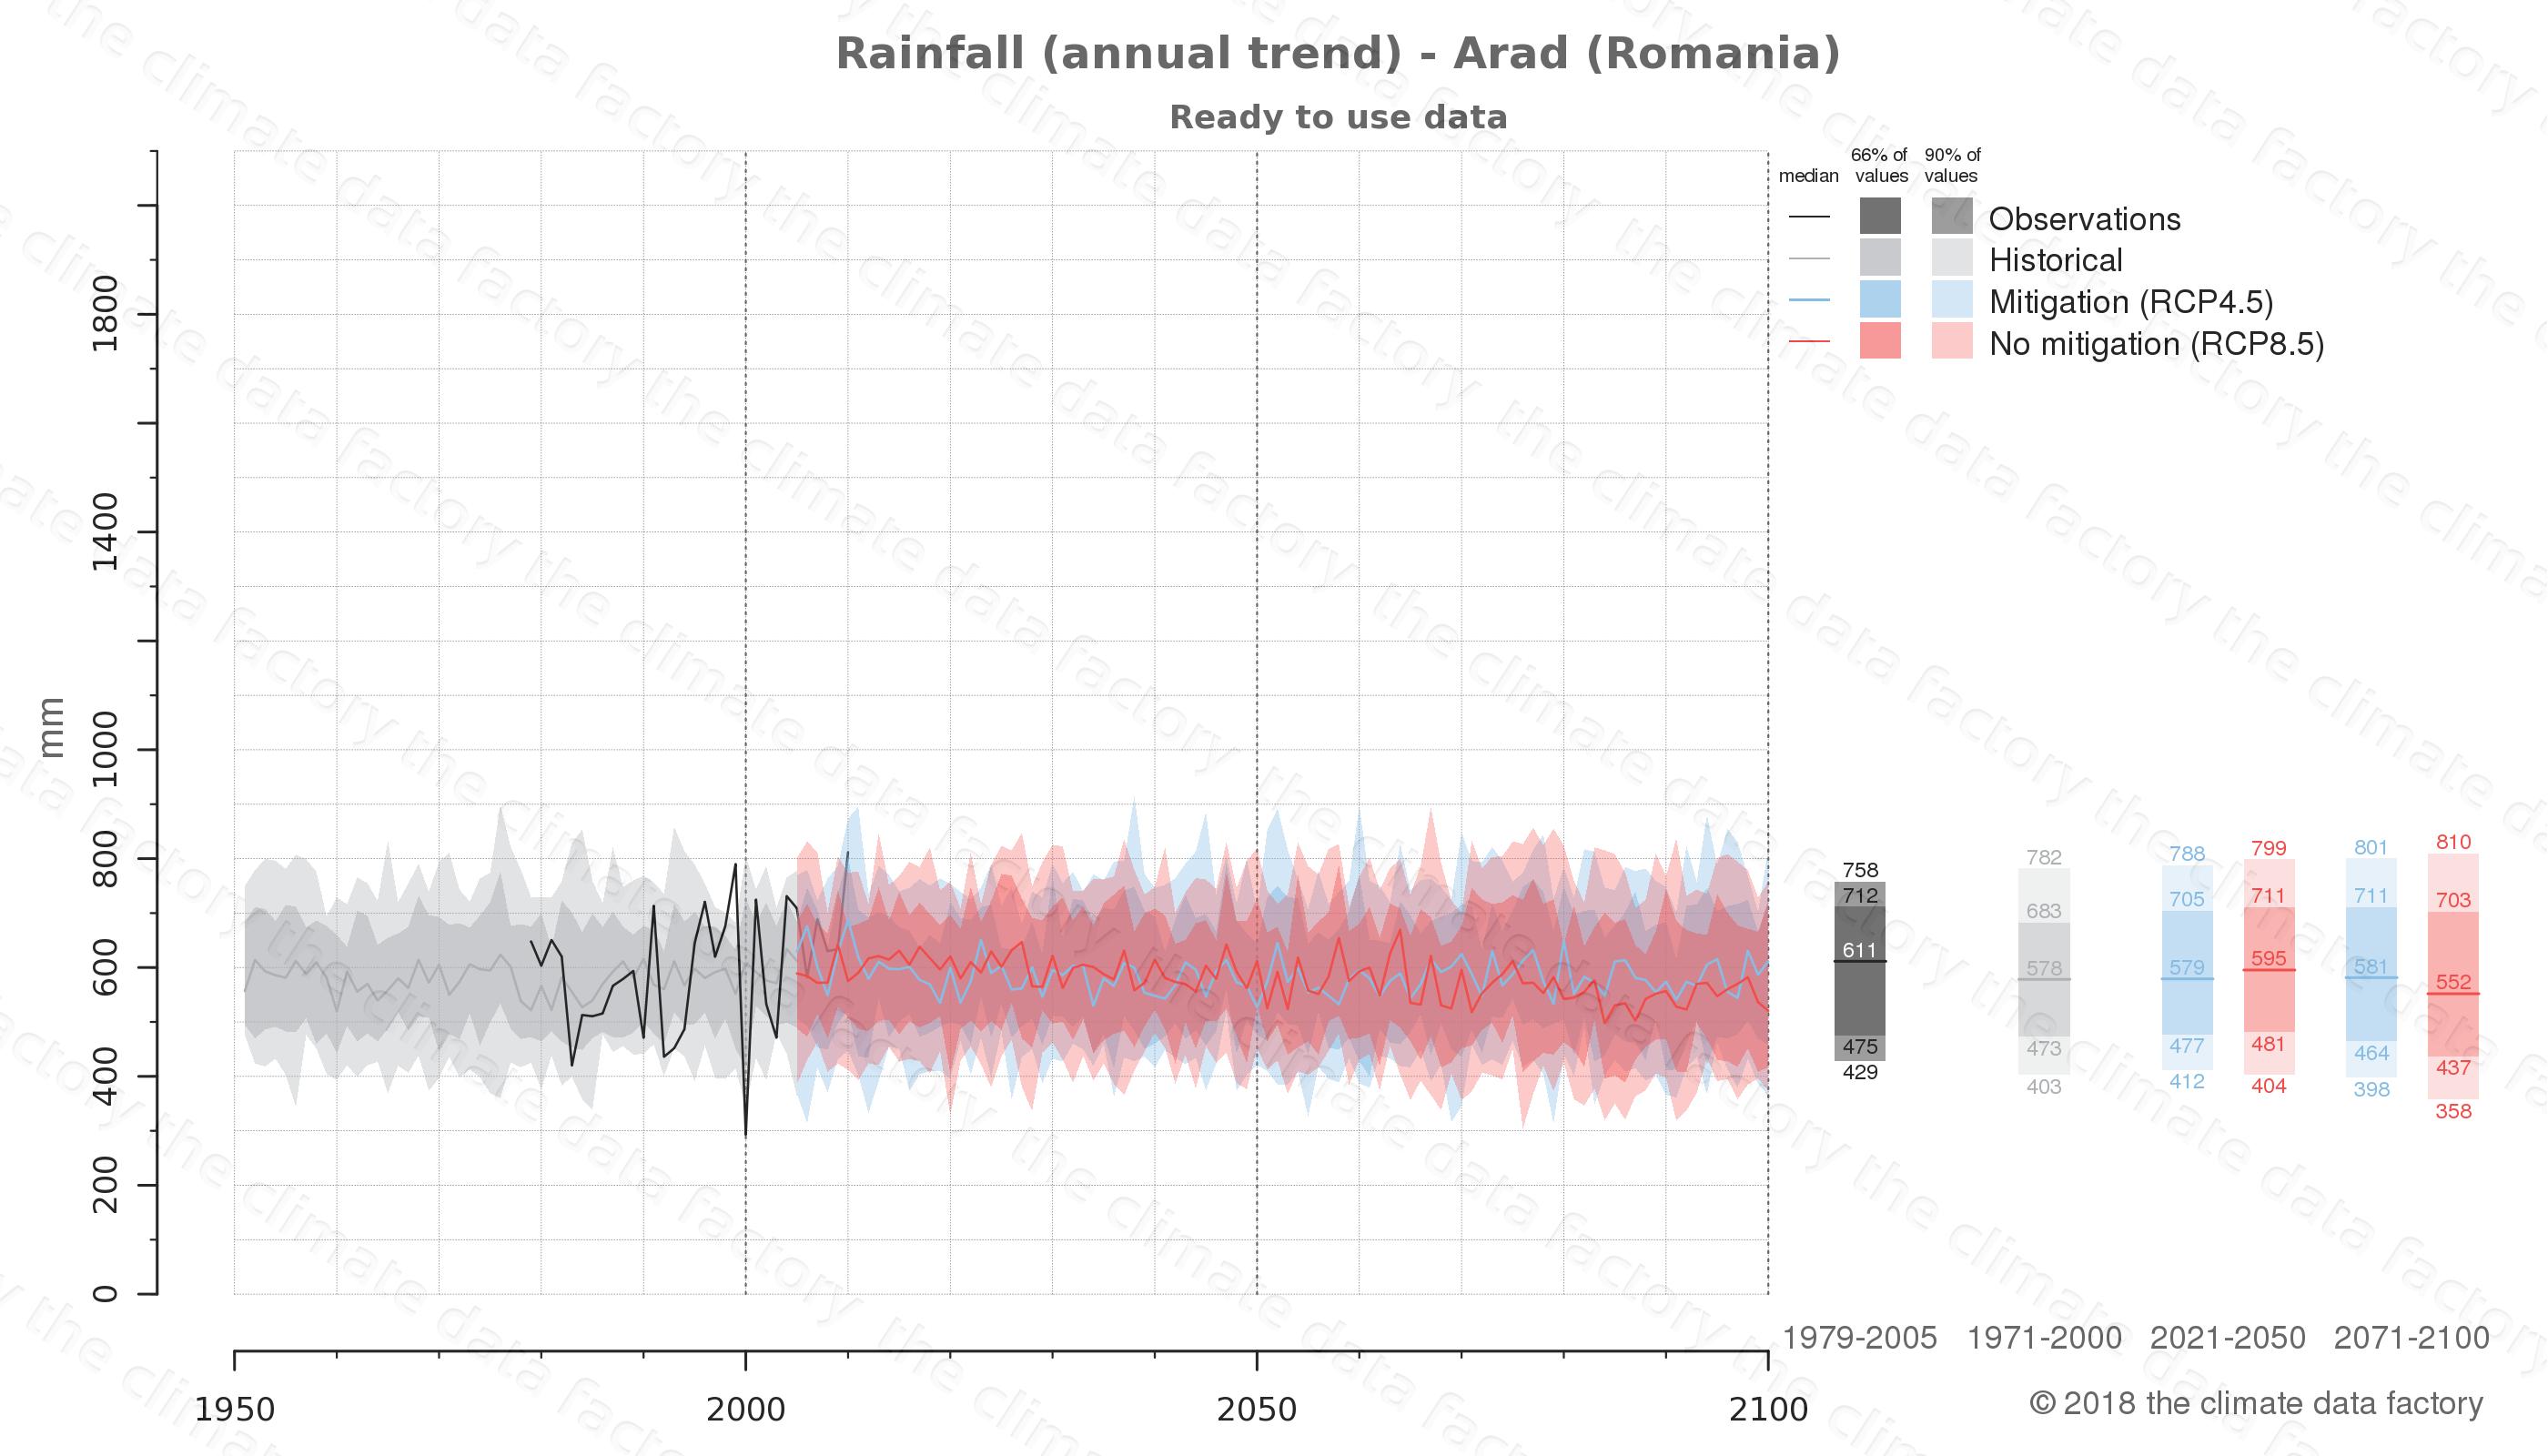 climate change data policy adaptation climate graph city data rainfall arad romania